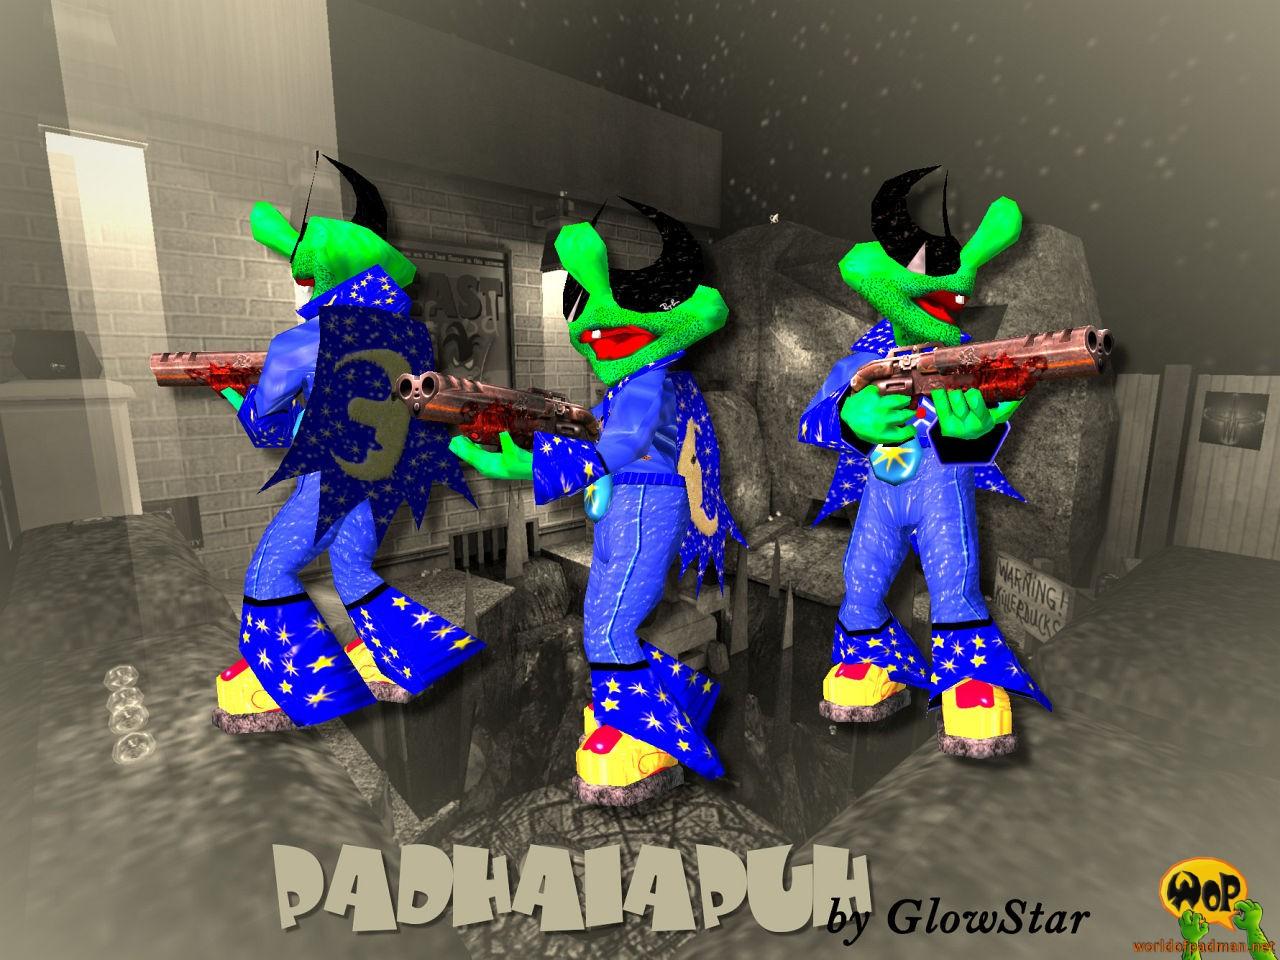 PadHaiapuh for Quake 3 Arena